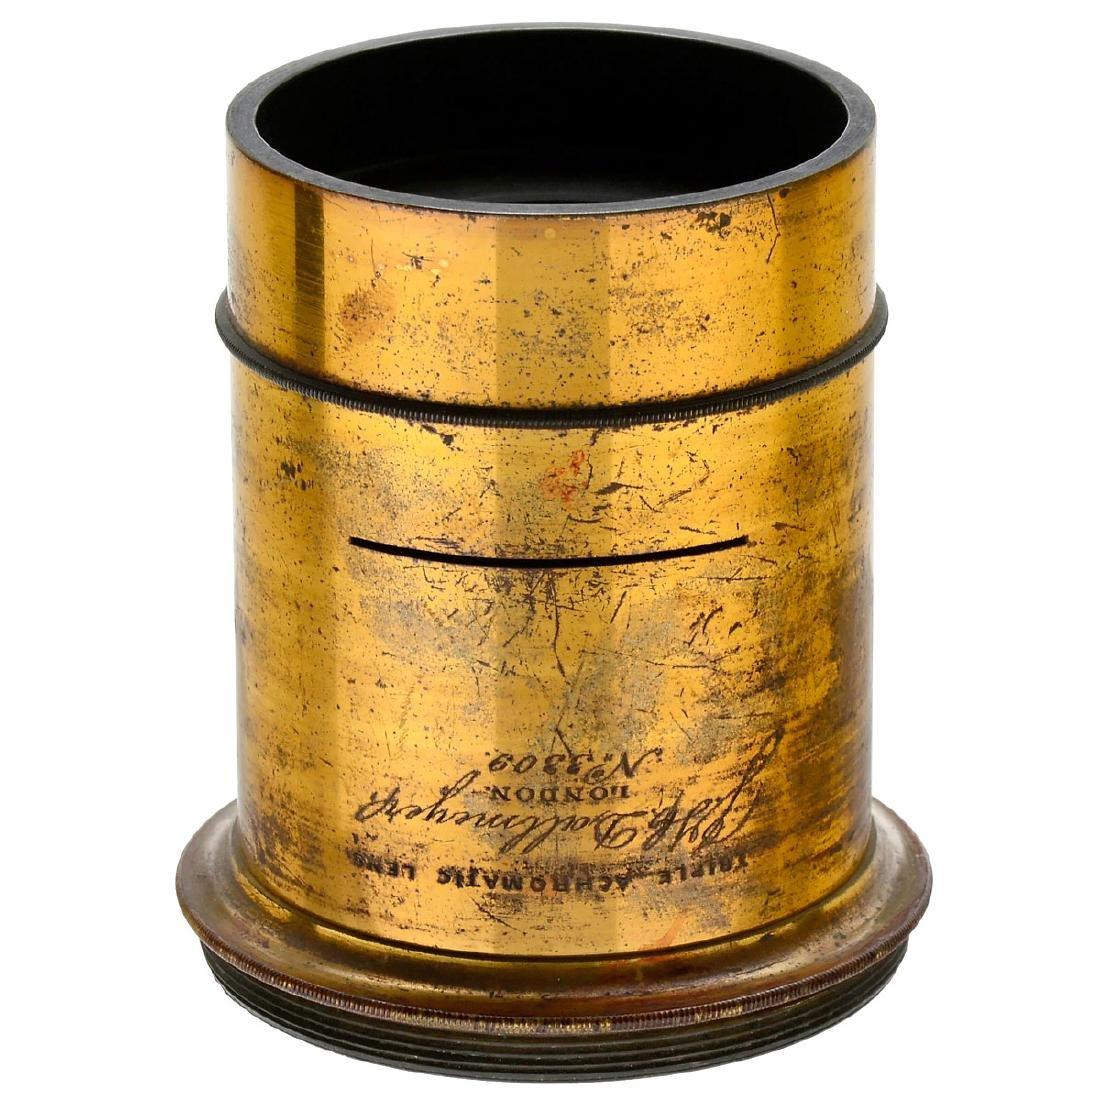 J.H. Dallmeyer Triple Achromatic Lens, c. 1858